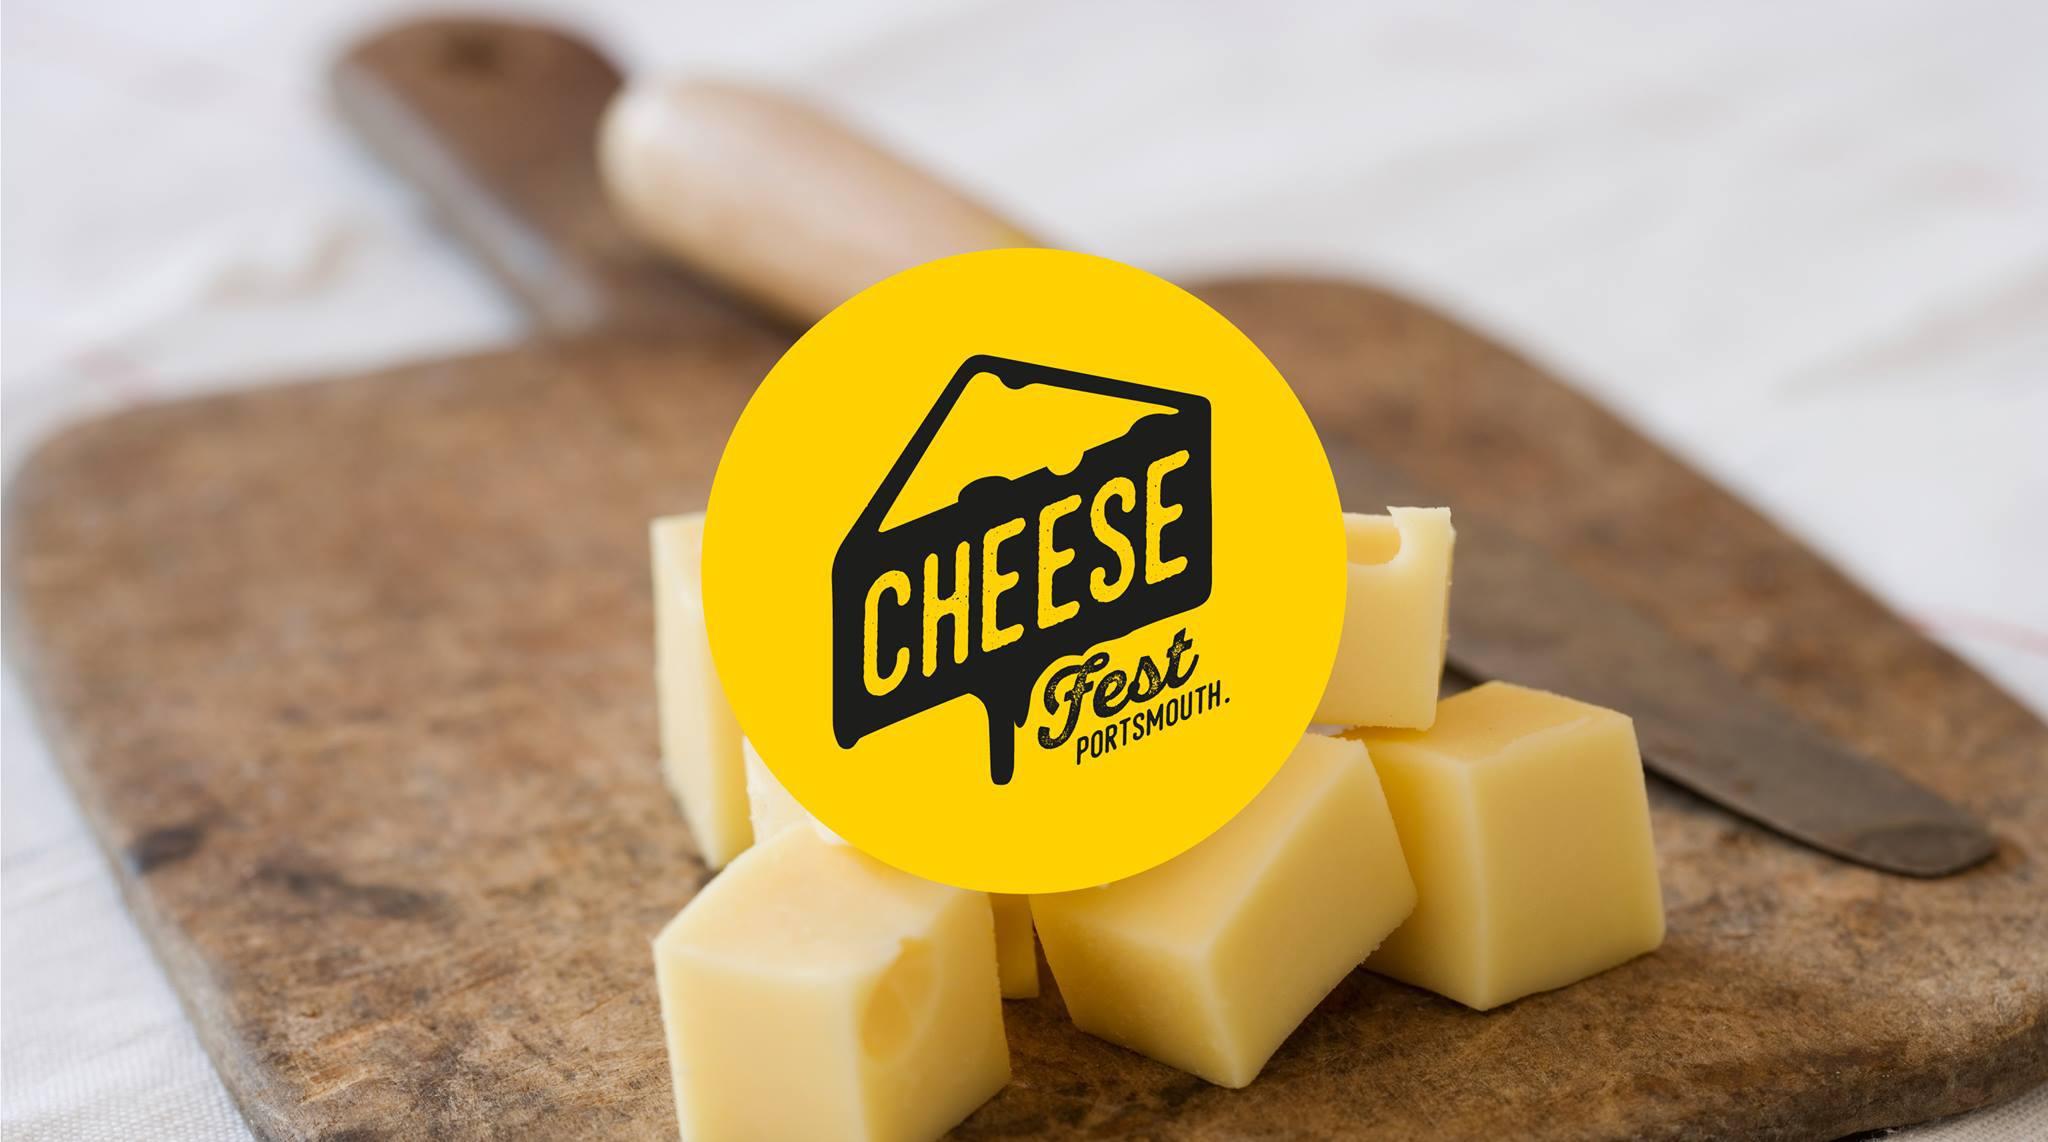 cheese-fest-portsmouth.jpg